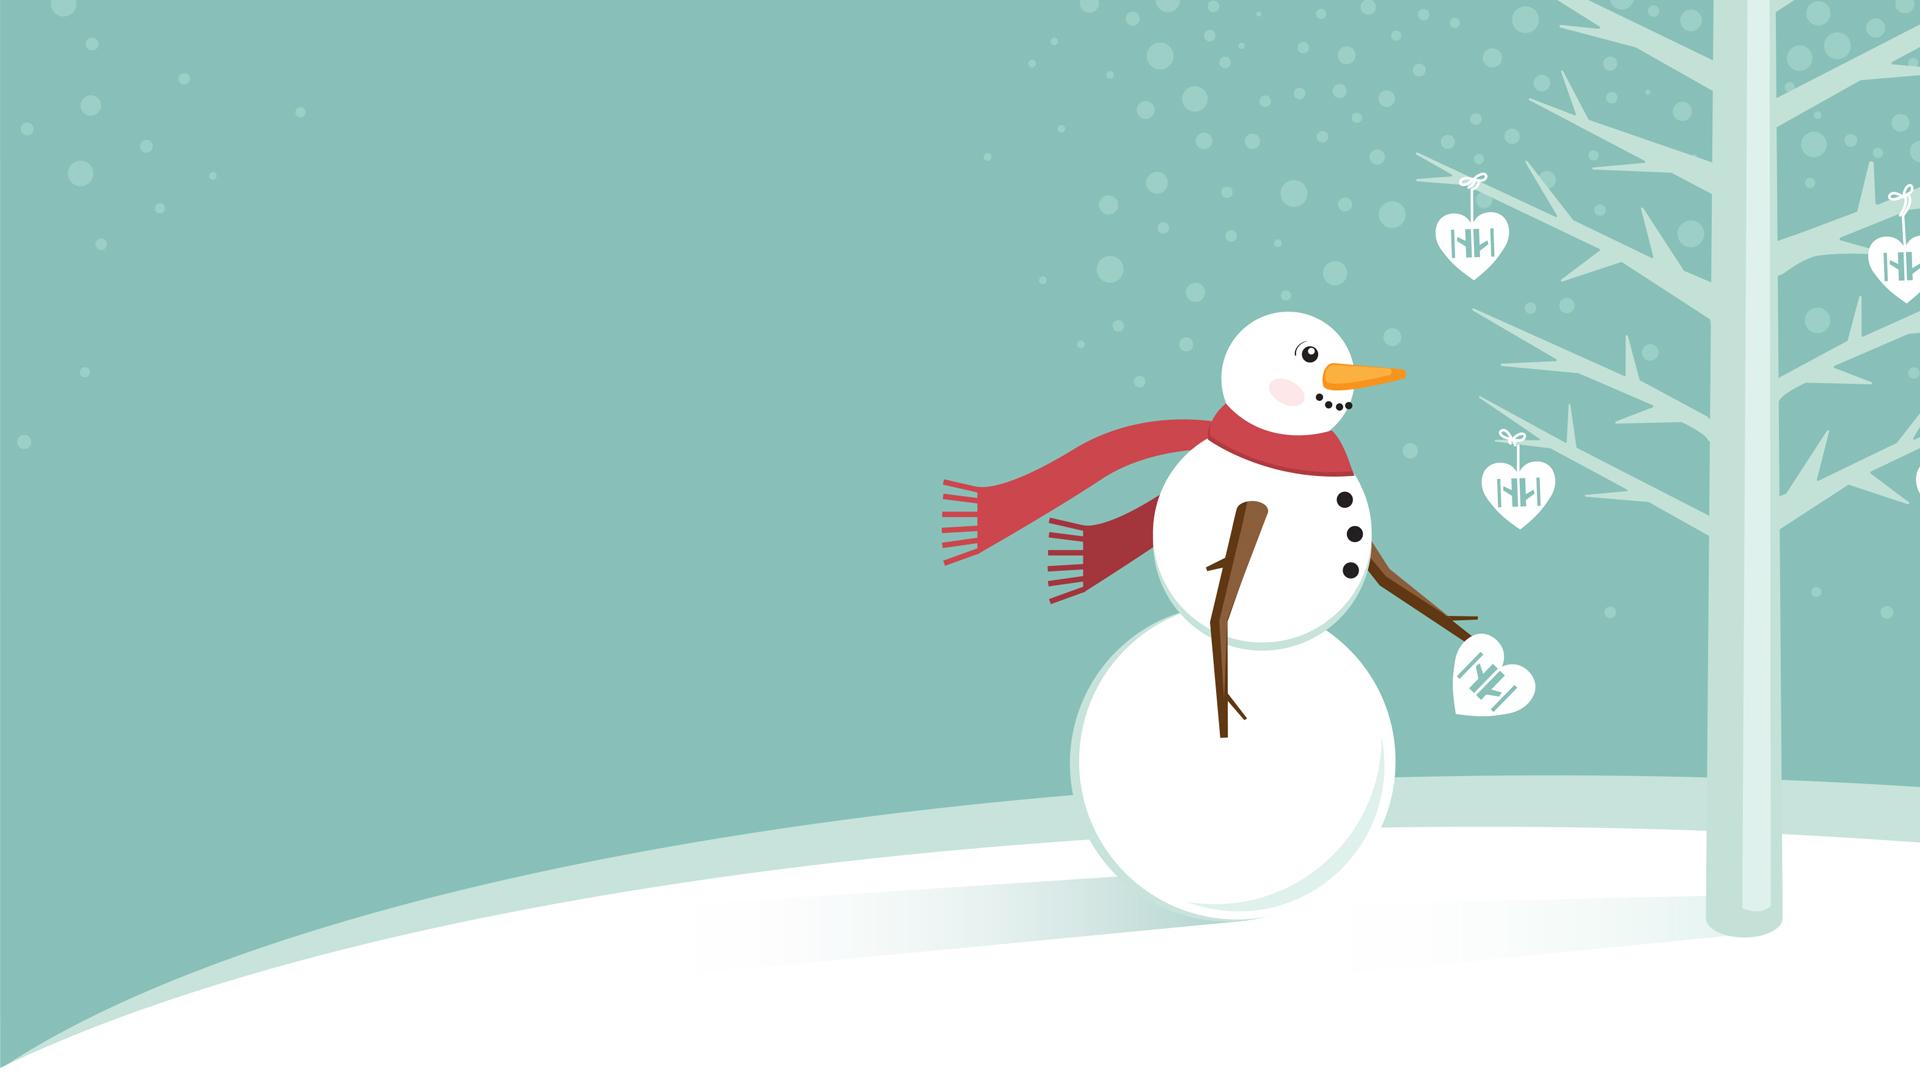 snowman winter wish